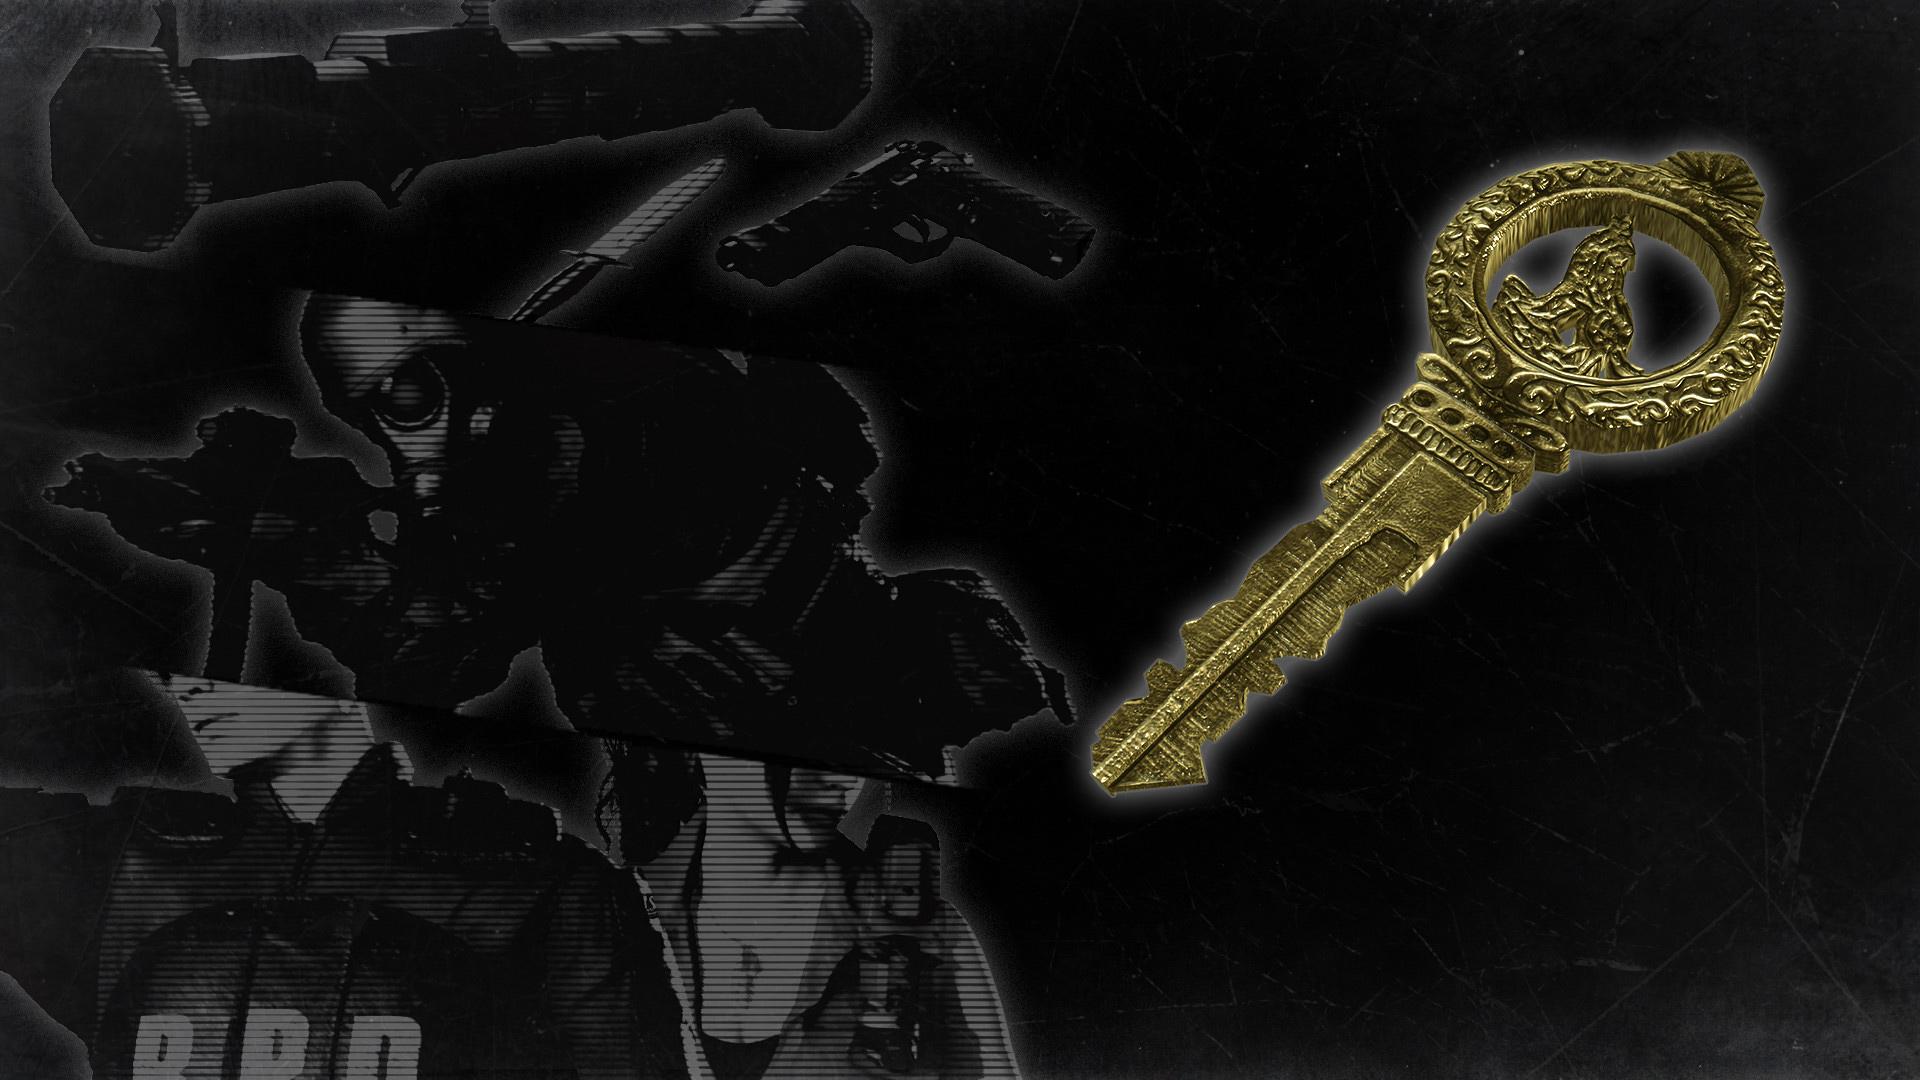 Resident Evil 2 is selling a shortcut to unlock rewards screenshot